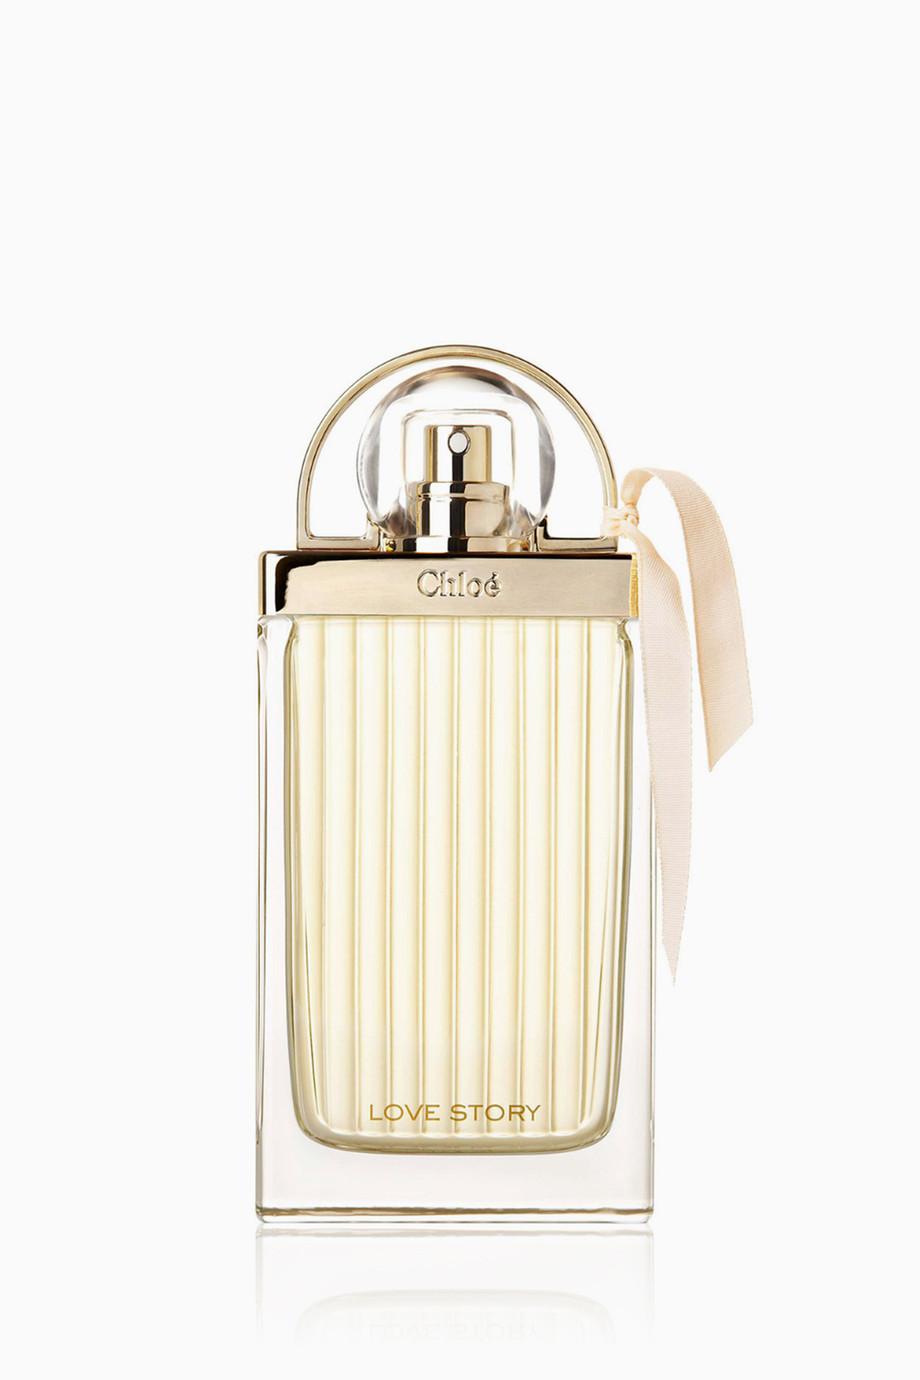 0aabe2ef7 تسوق ماء عطر لوف ستوري، 75ملل Chloé Perfumes ملون للنساء | اُناس ...